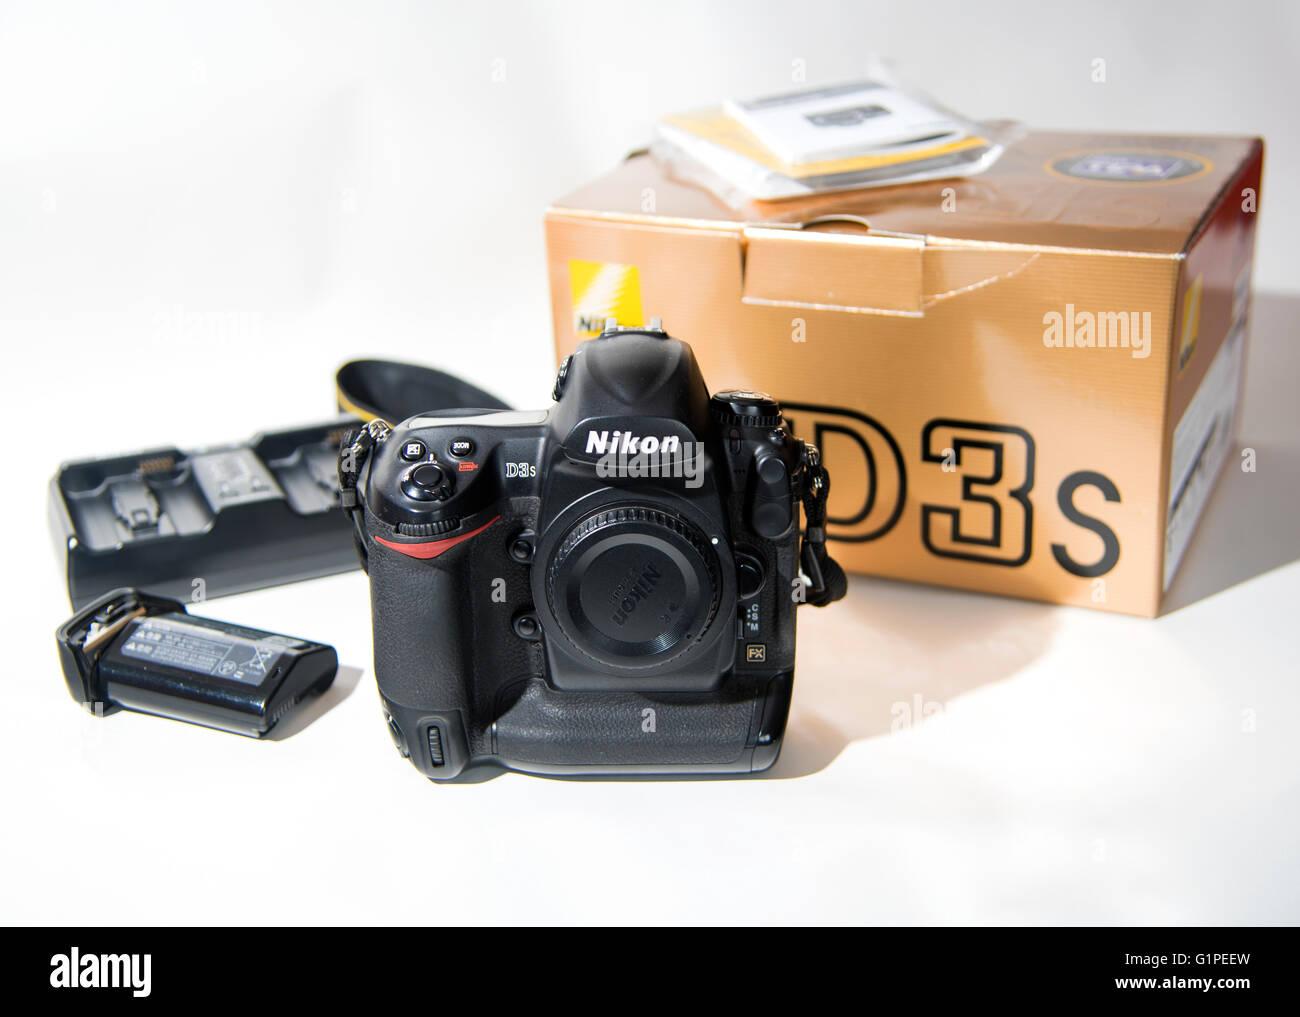 Nikon Dslr Stock Photos & Nikon Dslr Stock Images - Alamy